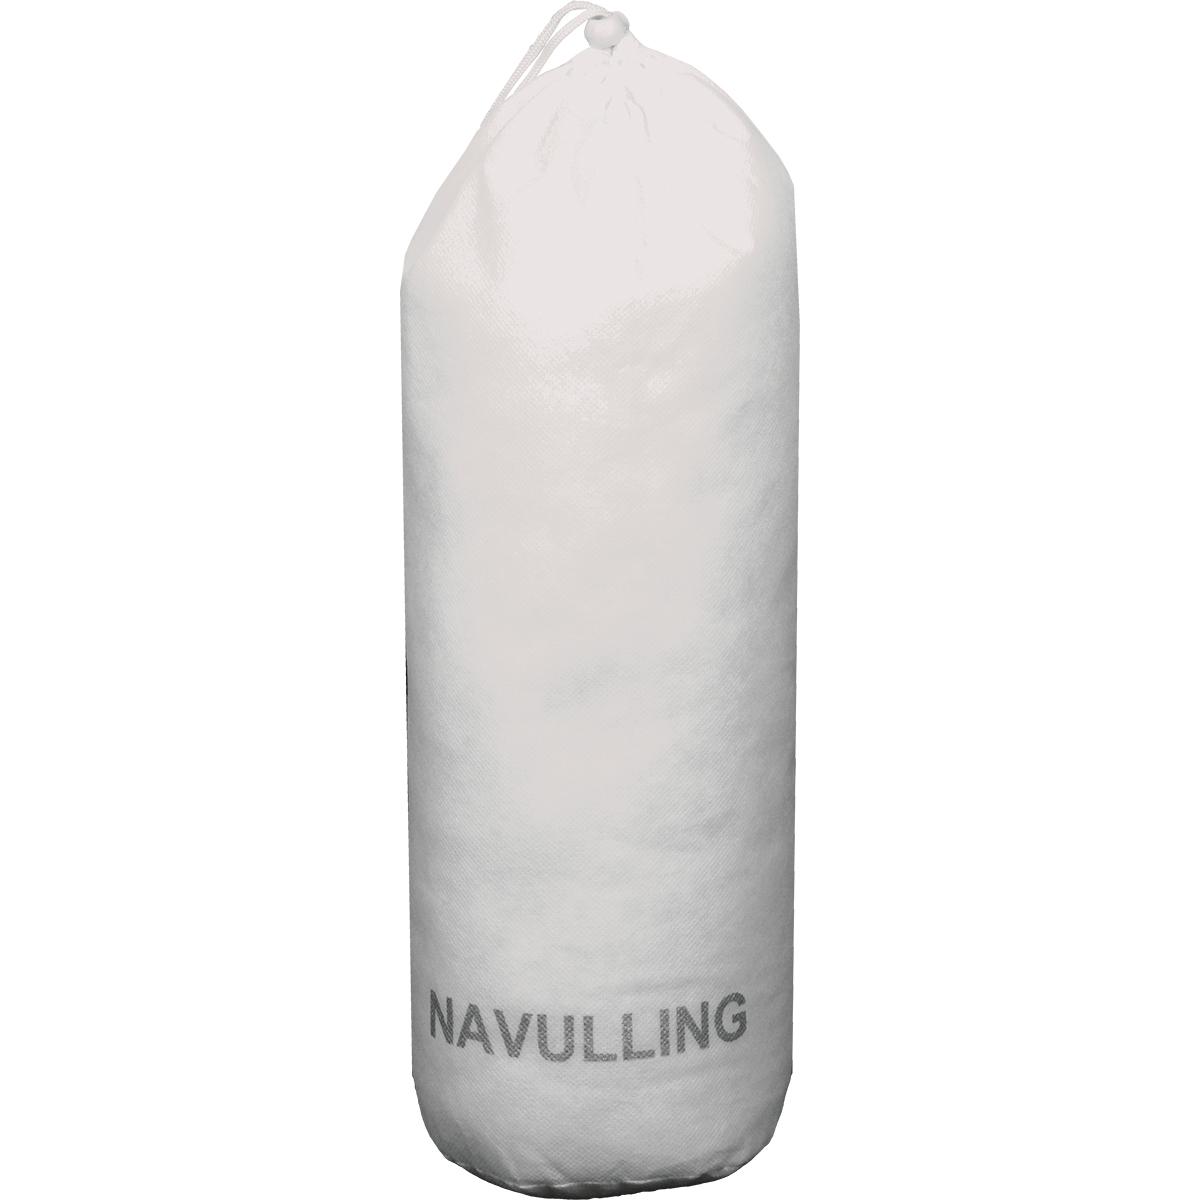 Polydaun navulling Comfort-O-Bol